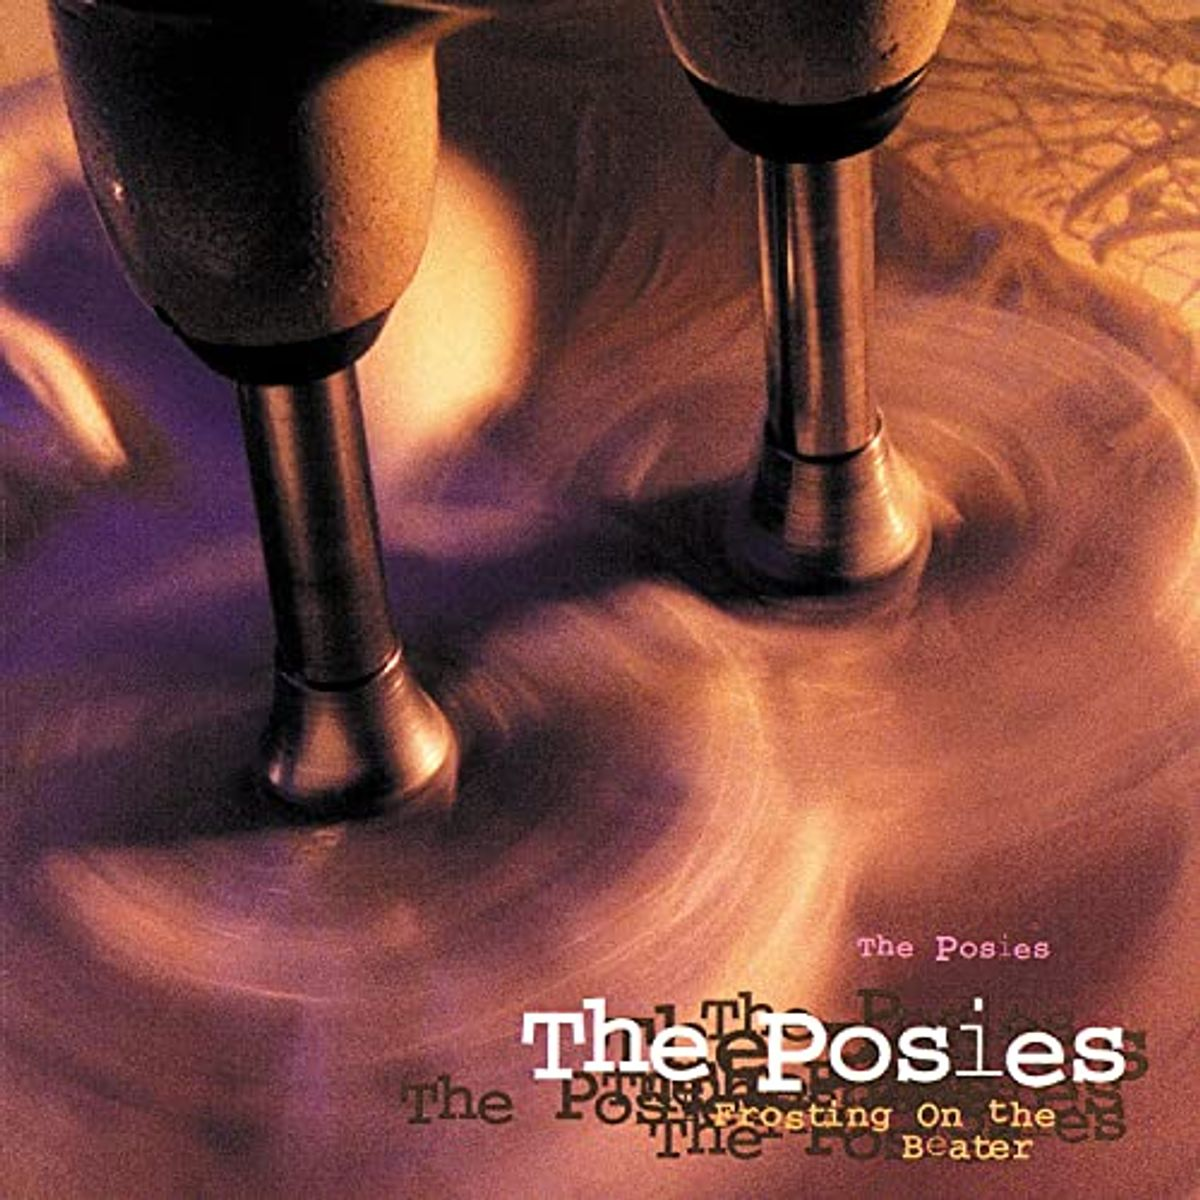 #FijnBesnaard - The Posies - Earlier Than Expected (1993)